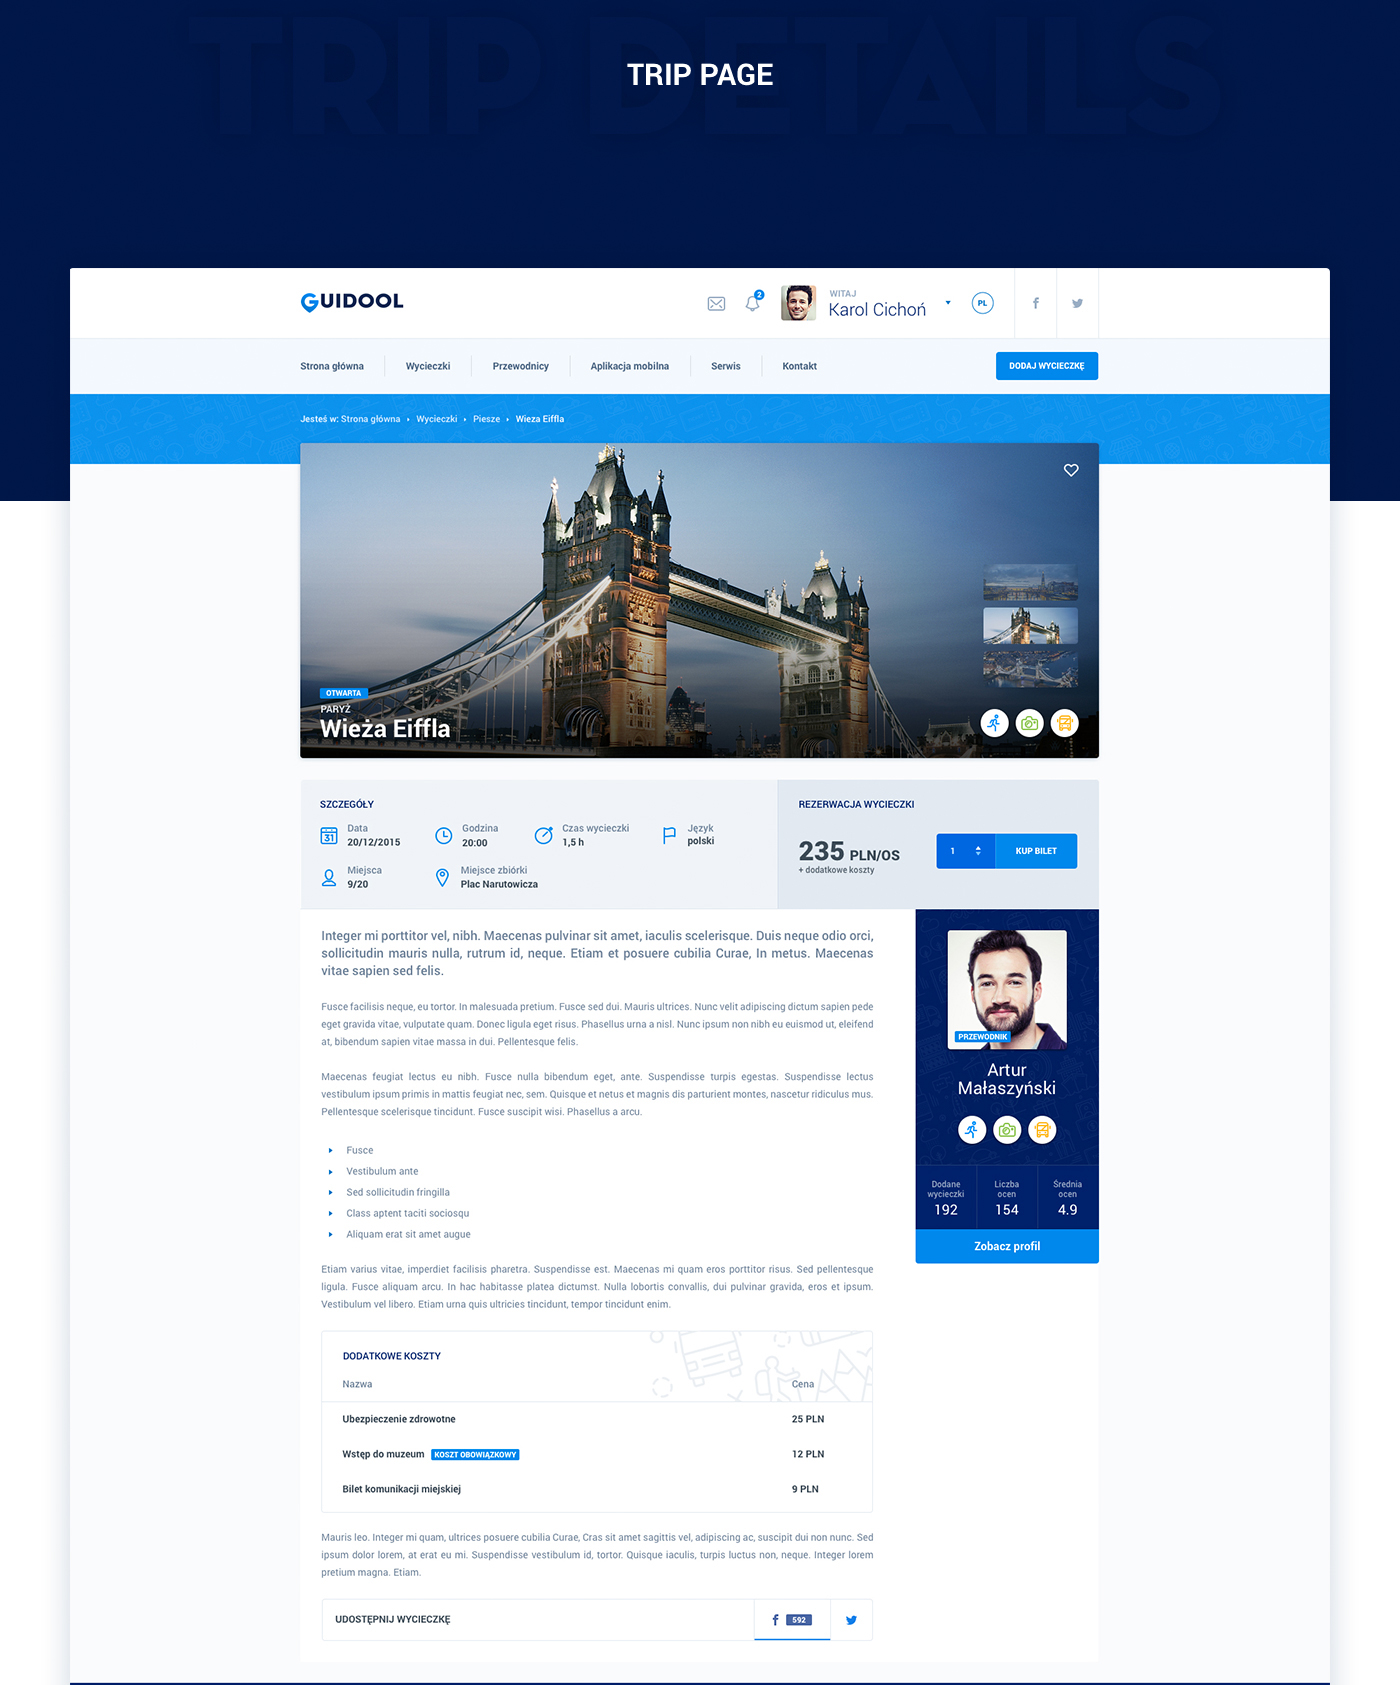 Webdesign tourist Guide Travel journey holidays search trips Platform wireframes